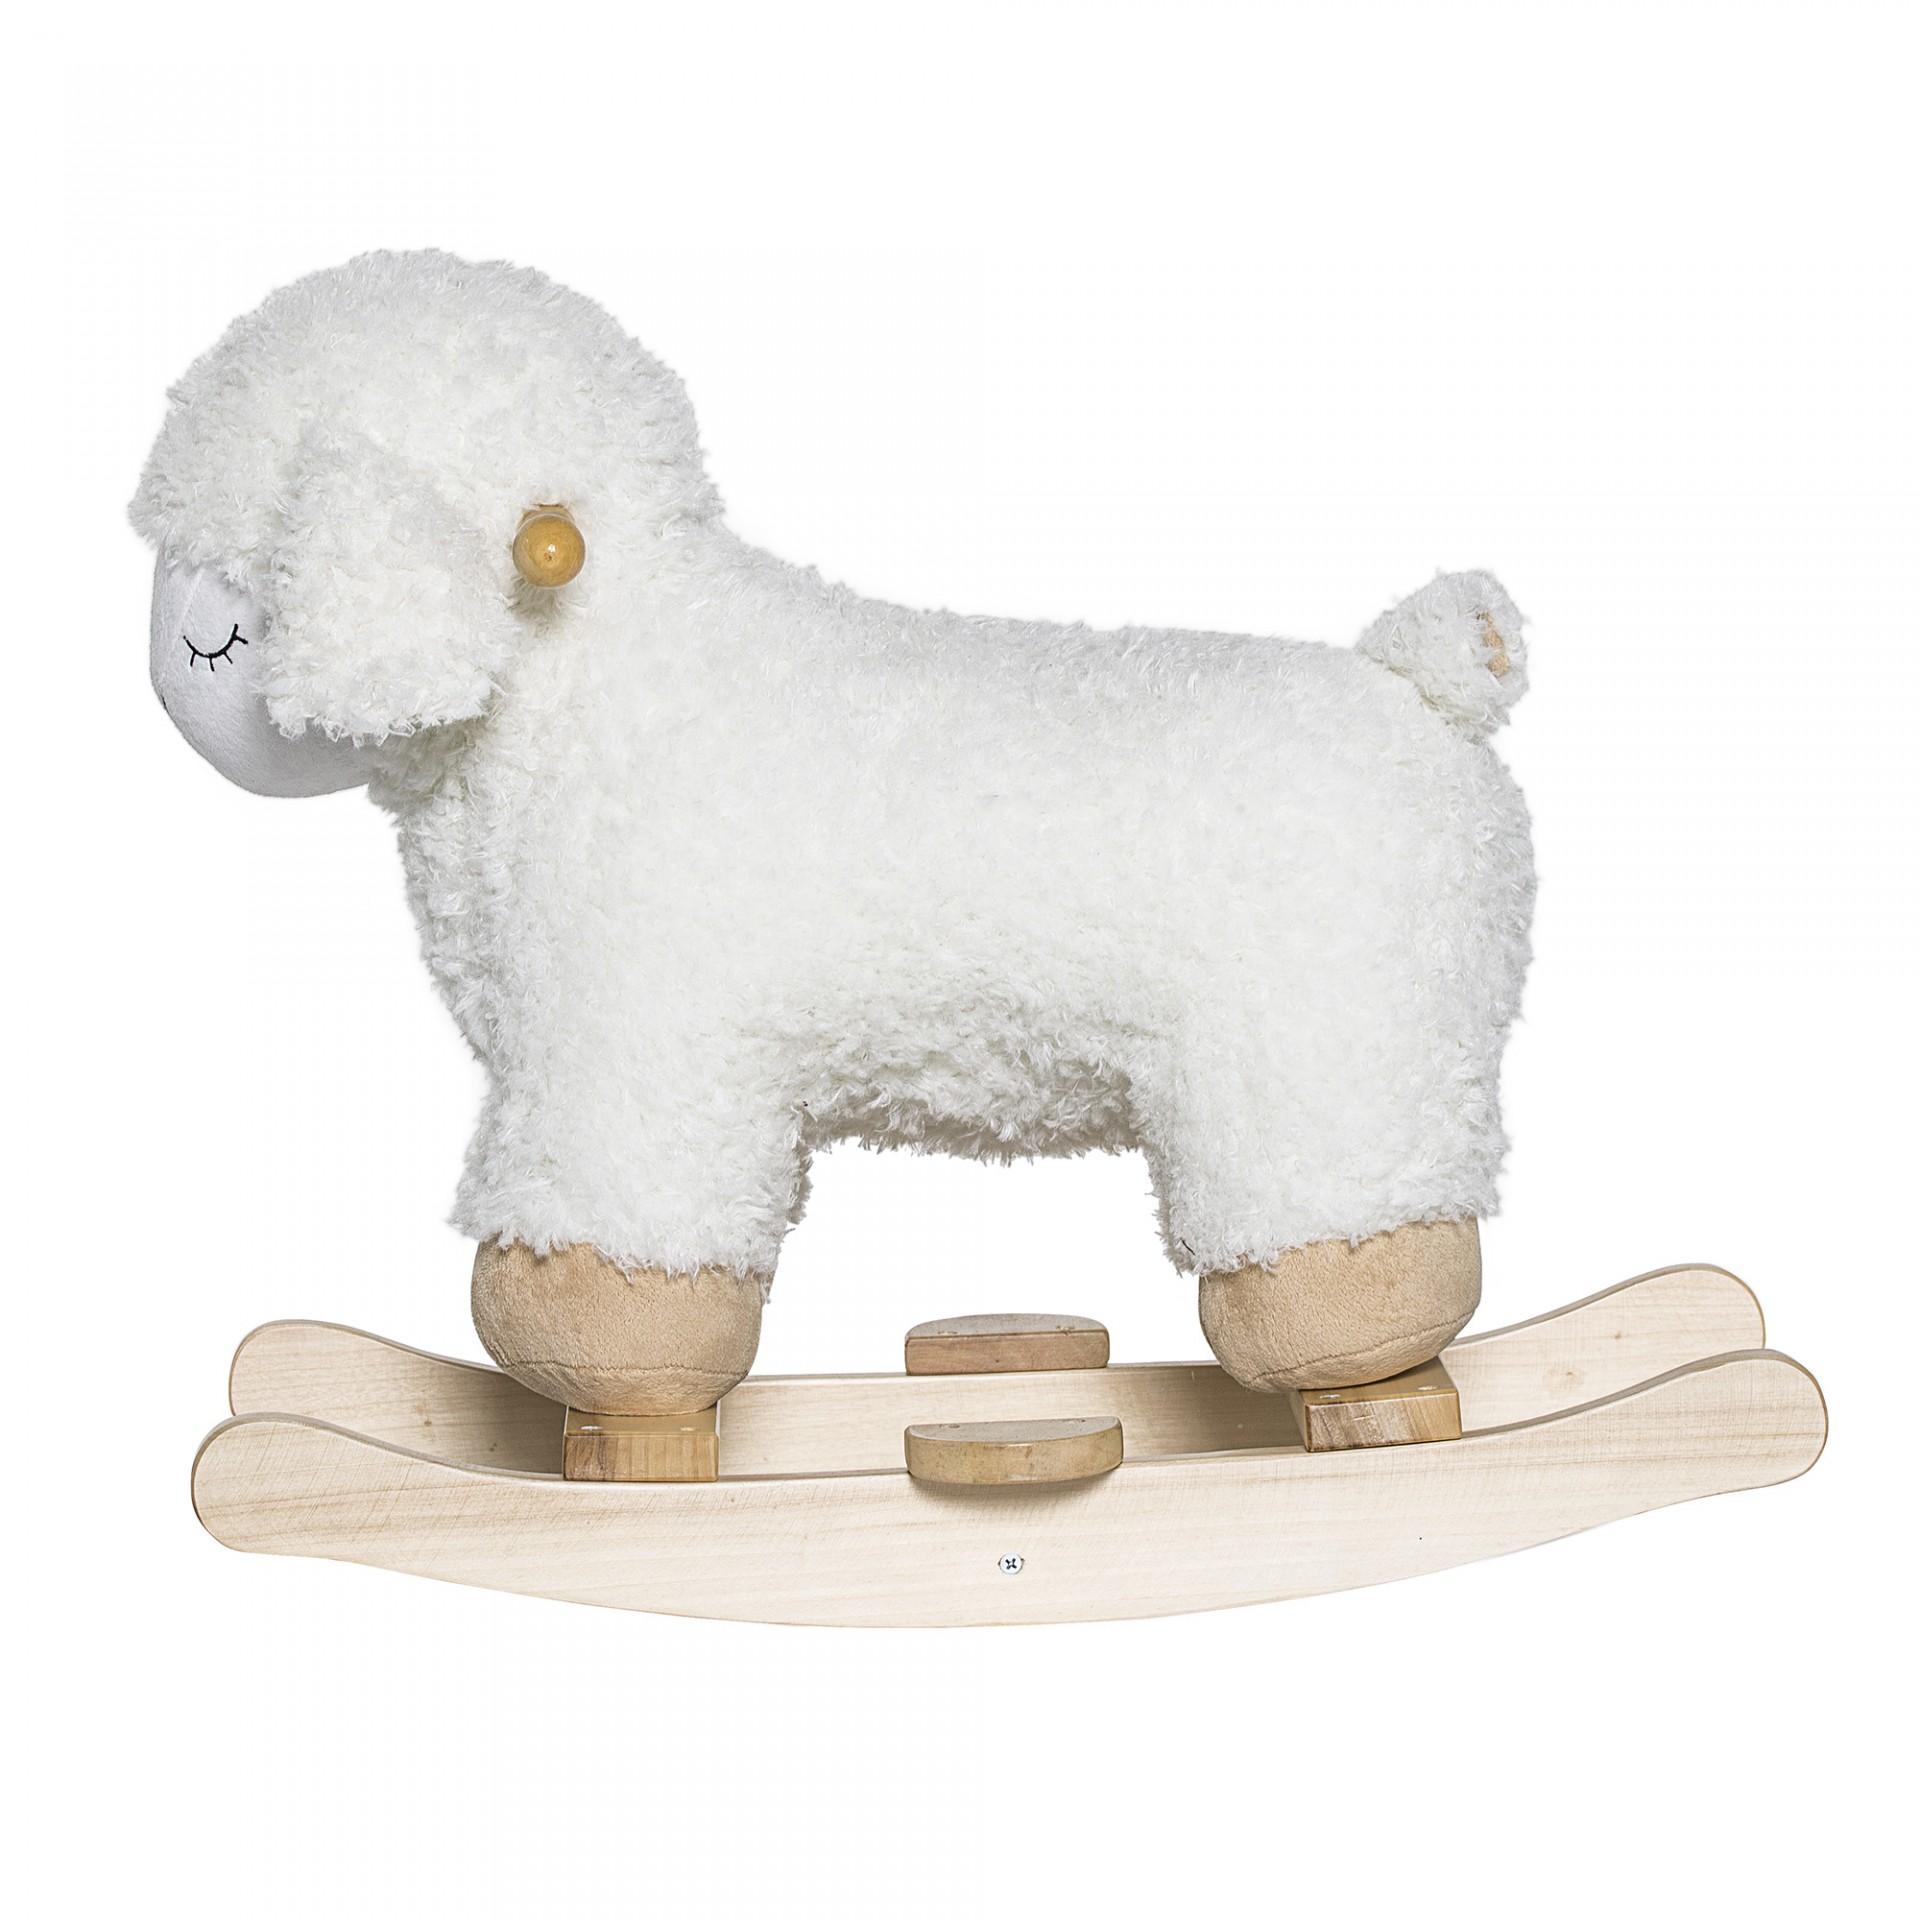 Ovelha de baloiço, poliéster/madeira, branco